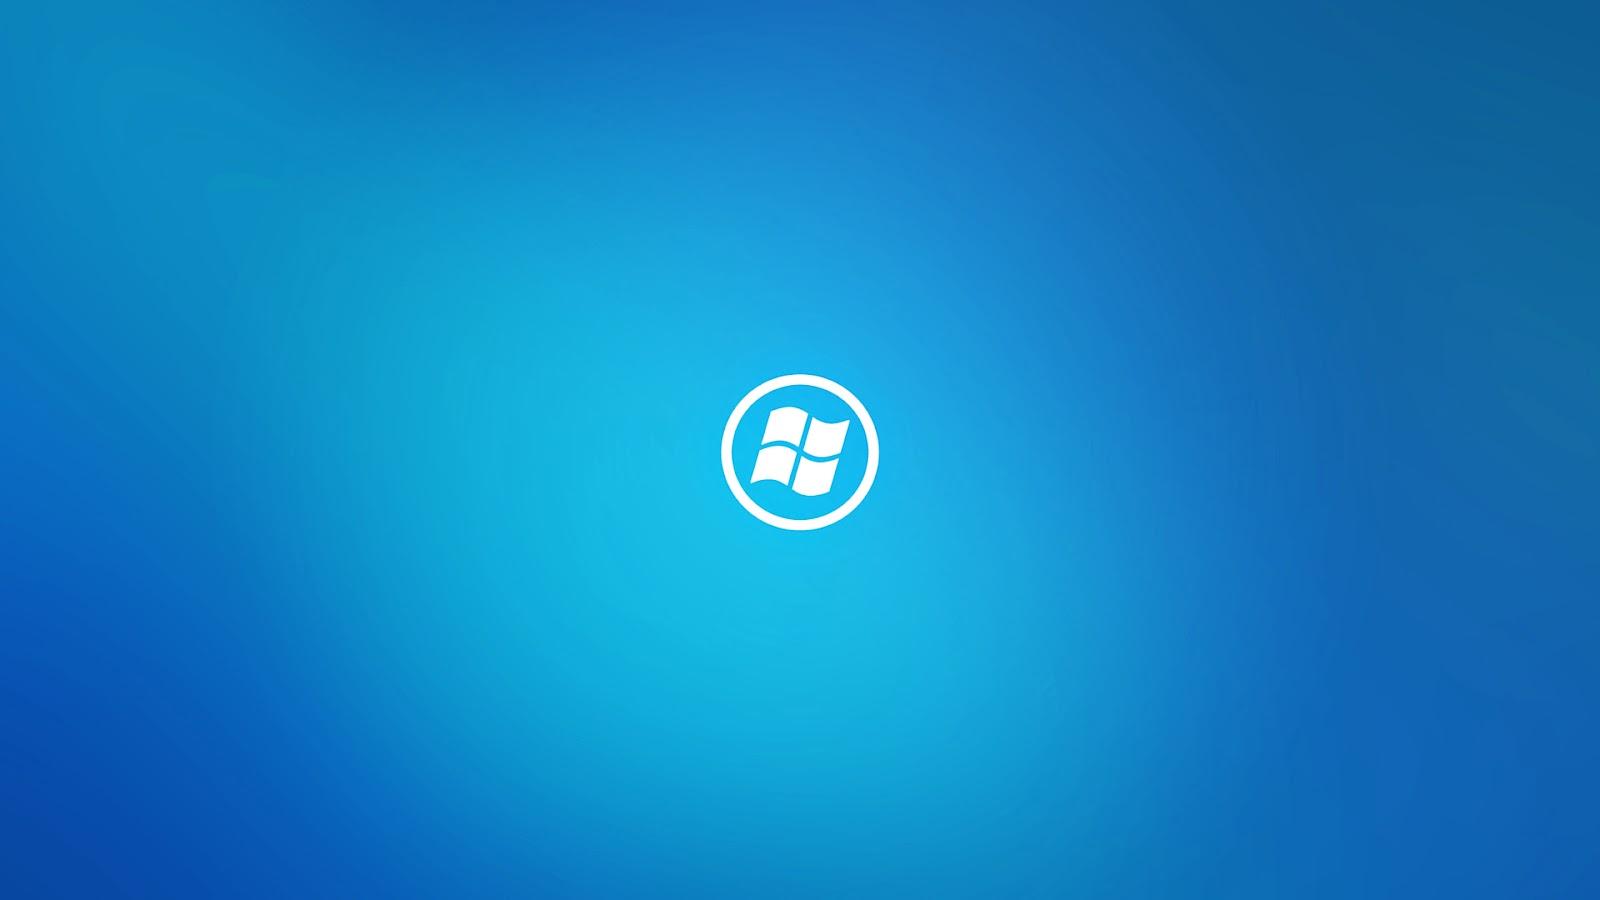 Wallpaper download for windows 10 - Windows 10 Wallpapers Windows 10 Wallpapers Download Free Windows 10